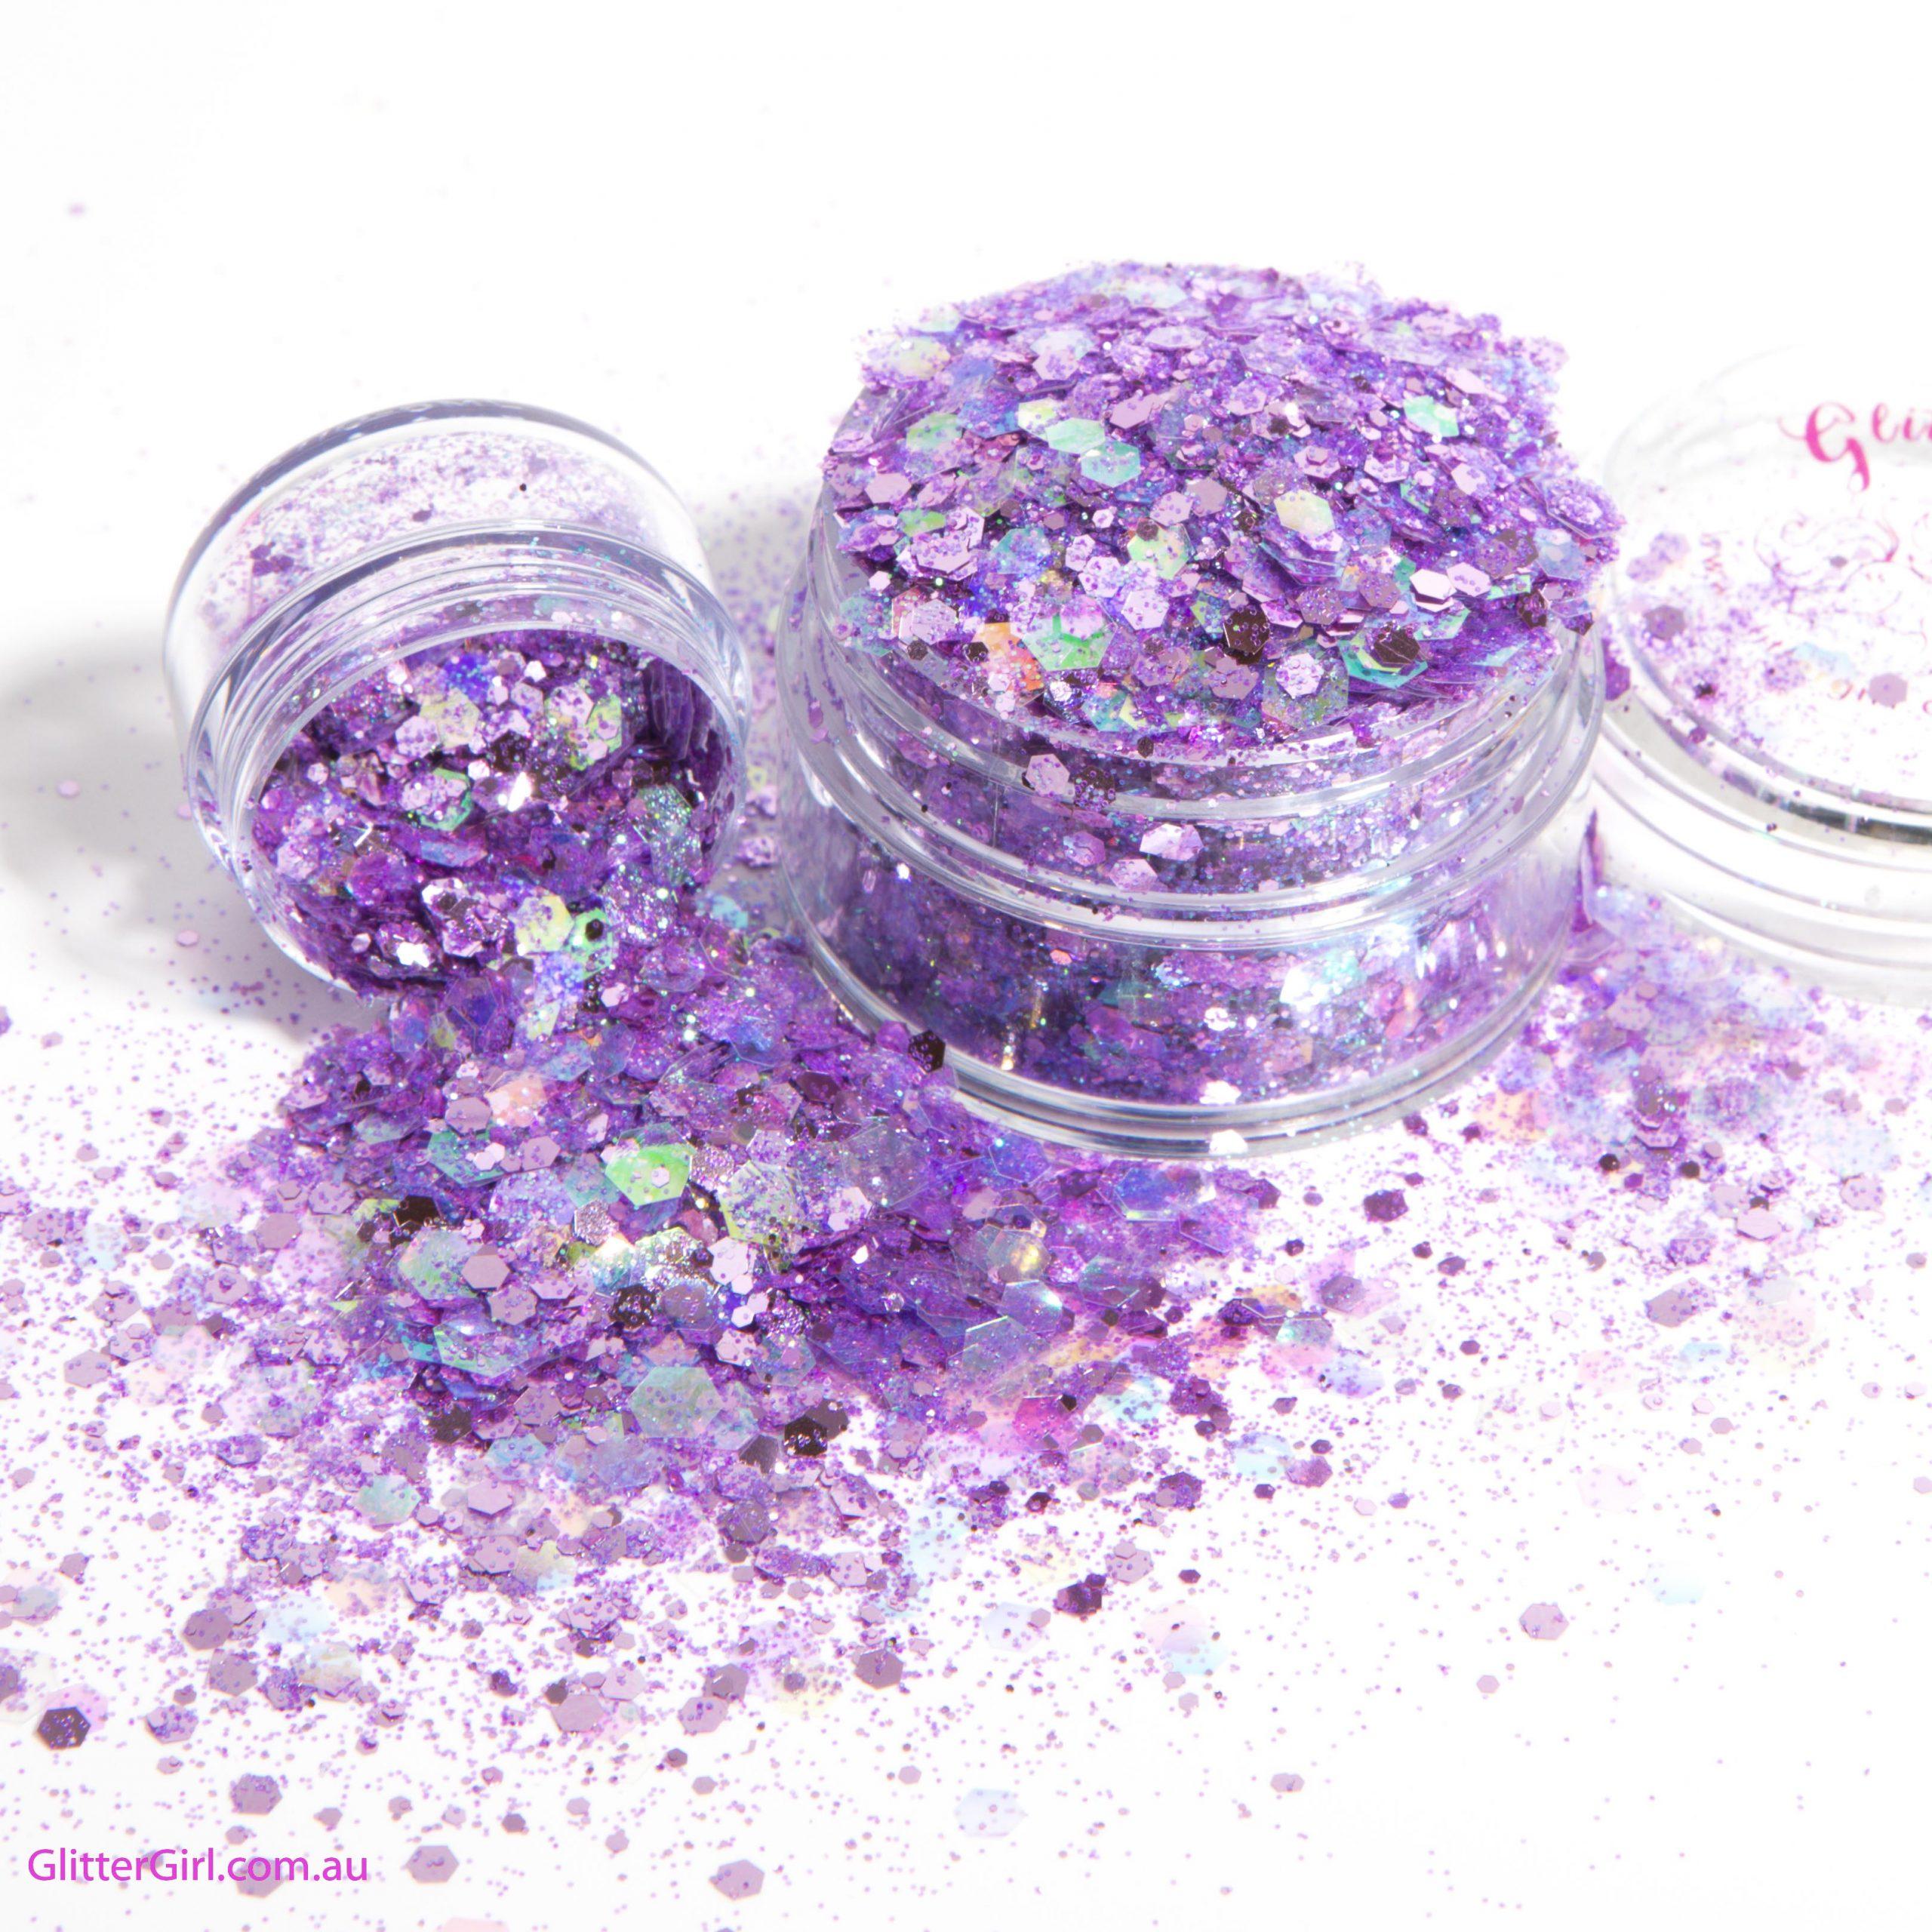 Glitter Girl Loose Glitter AllysWish_54